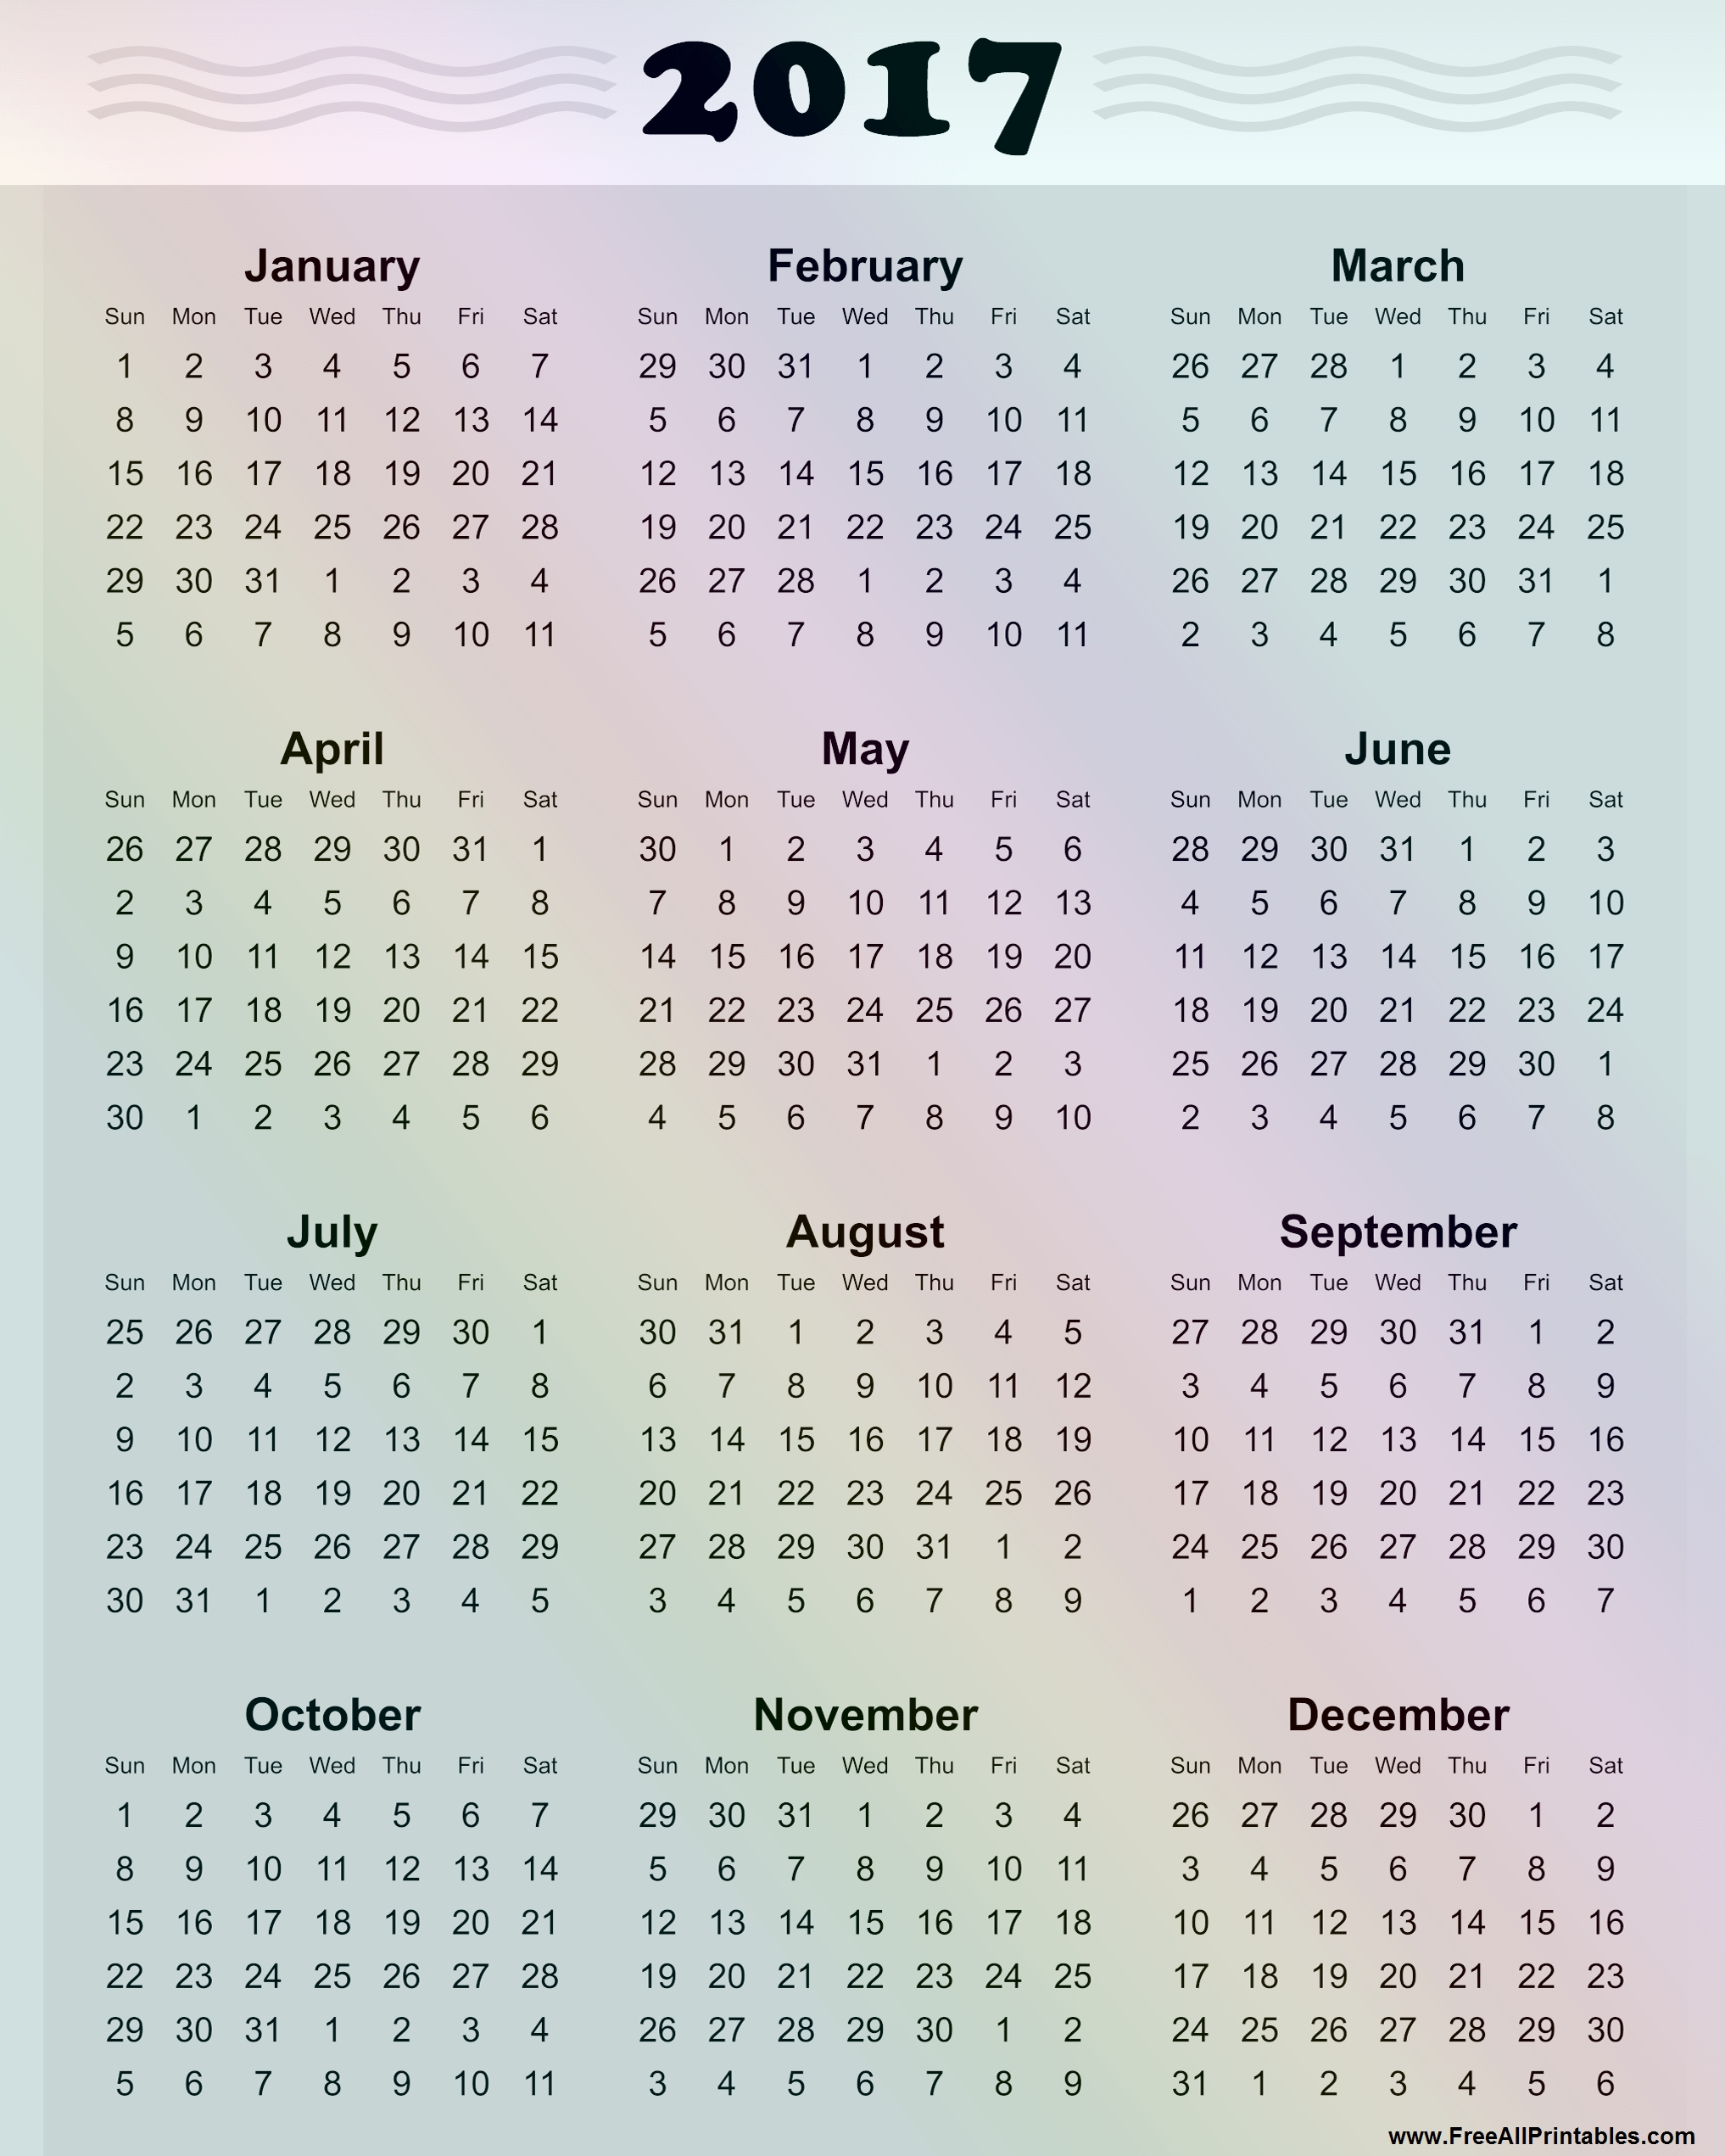 Free 2017 Calendar Pdf | Galaxy S Calendar Us Holidays 2017